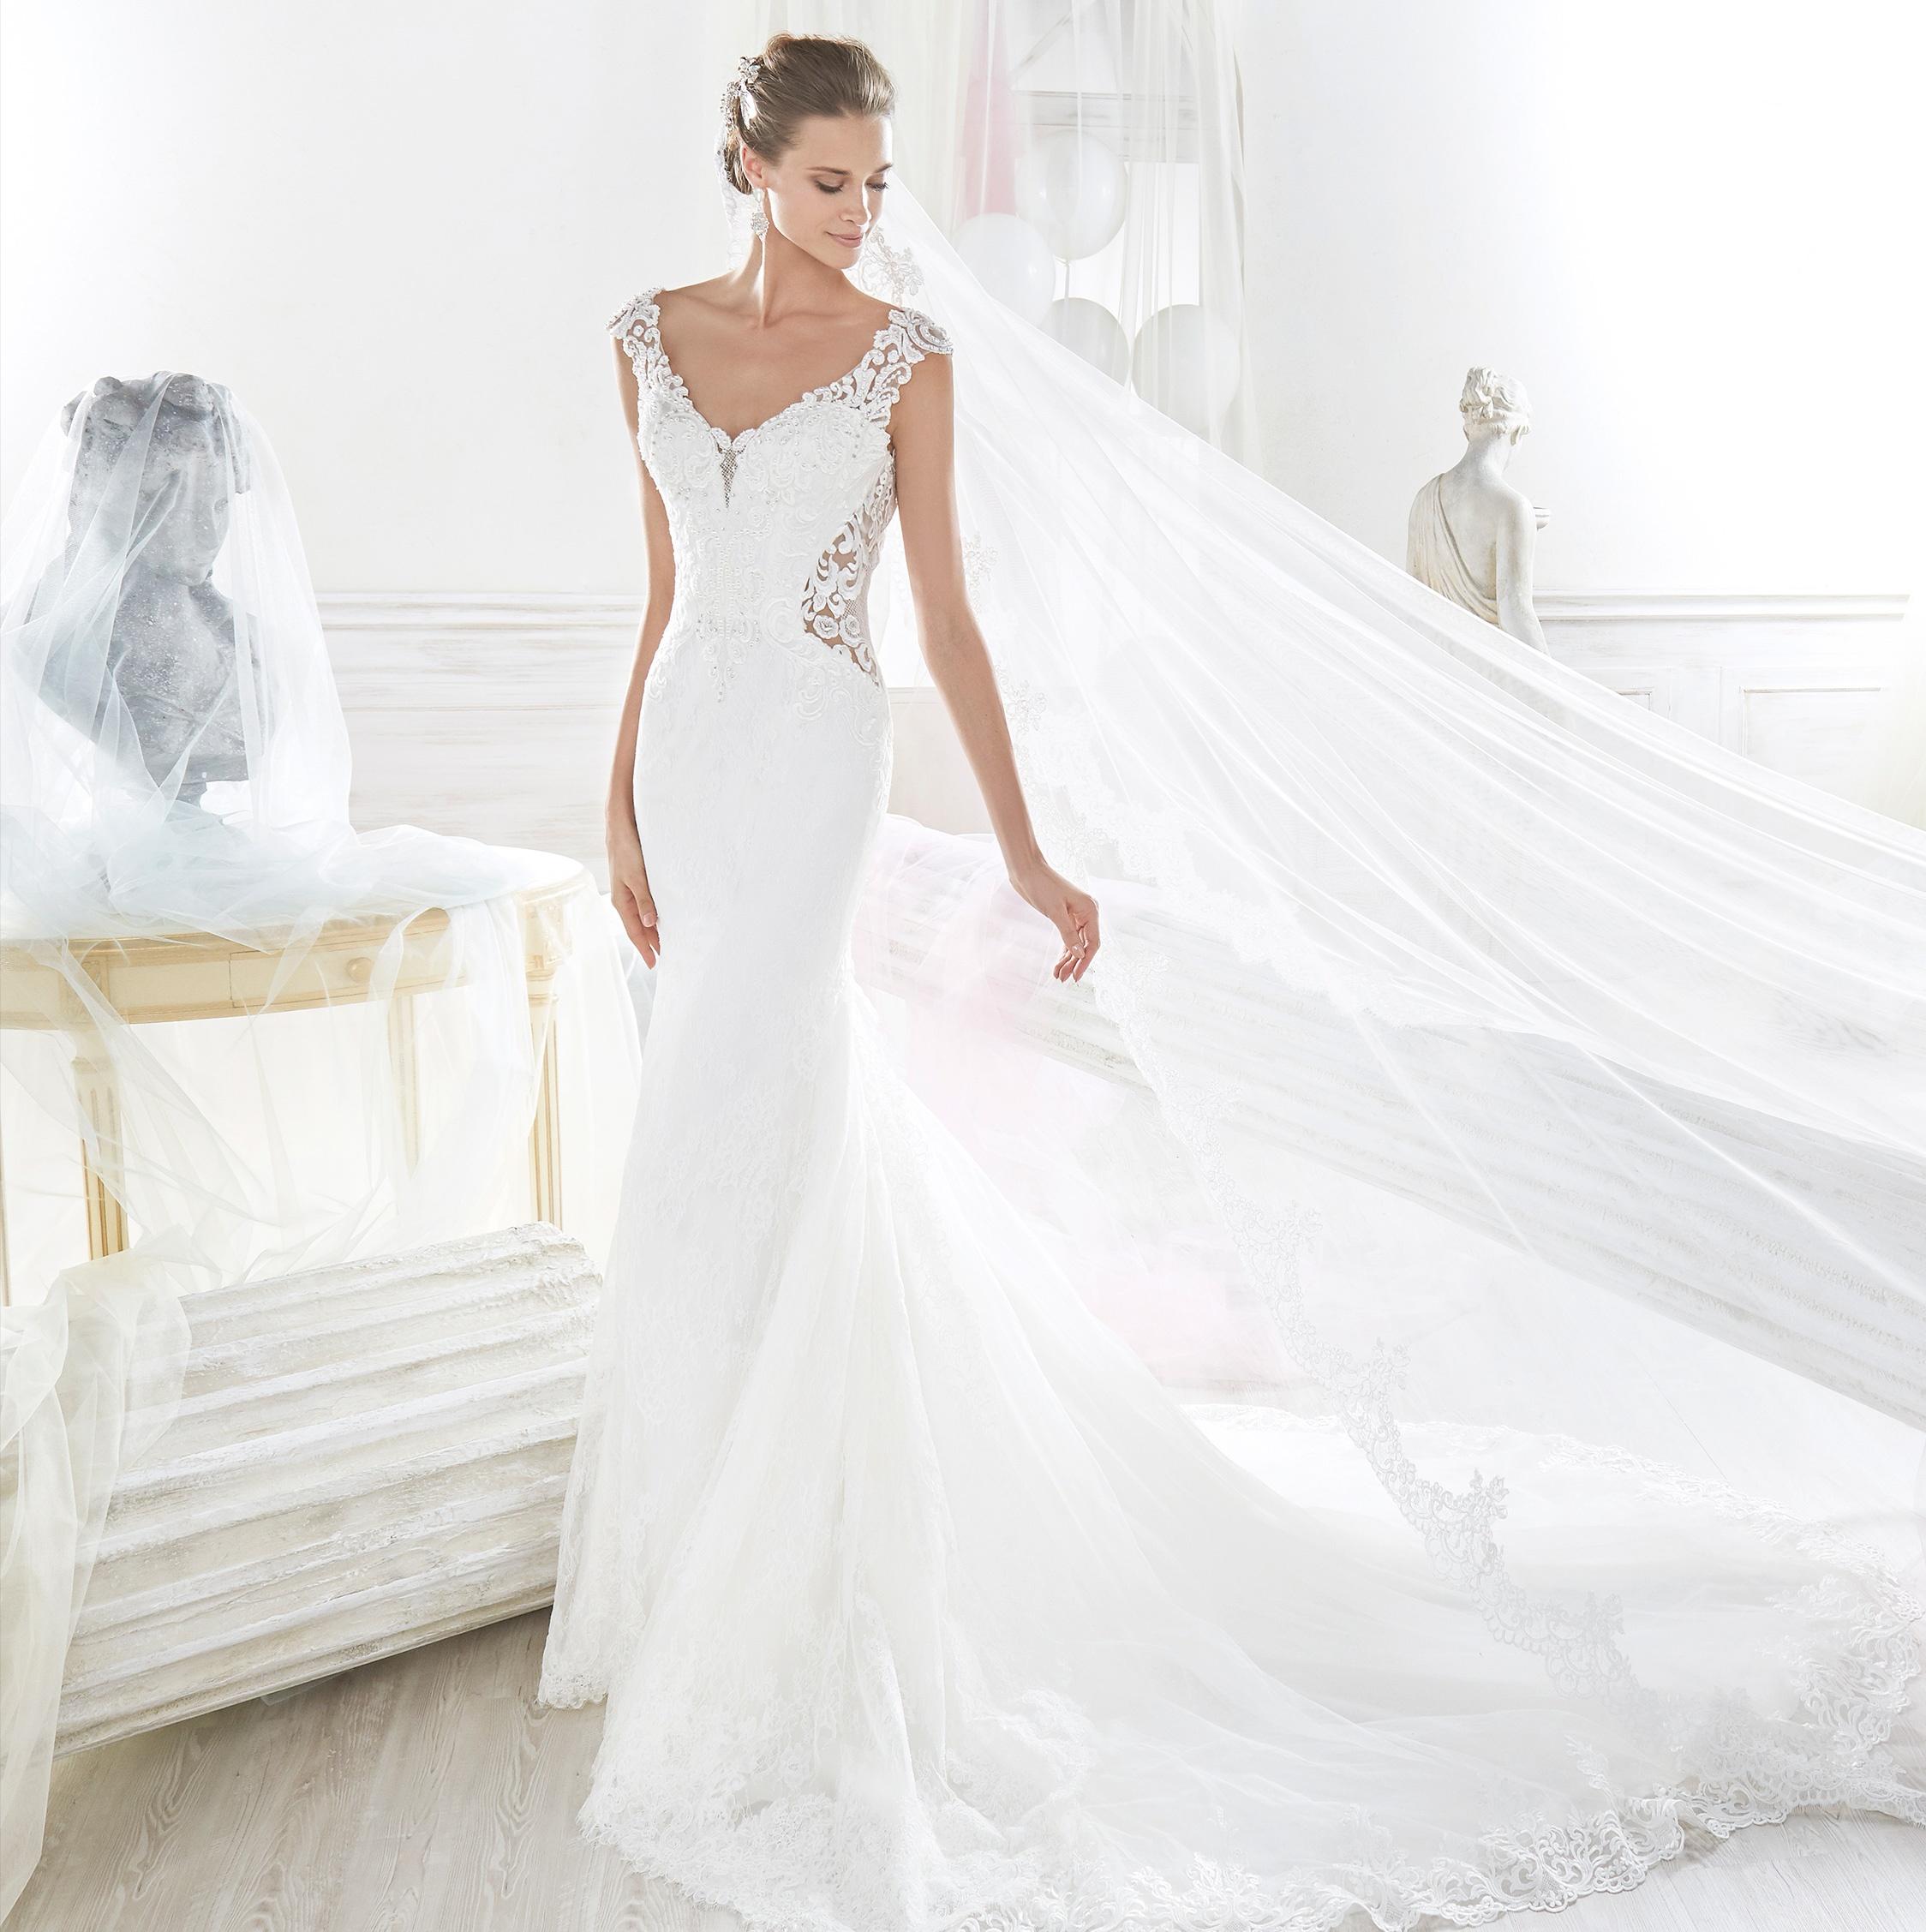 nicole-spose-NIAB18057-Nicole-moda-sposa-2018-798.jpg